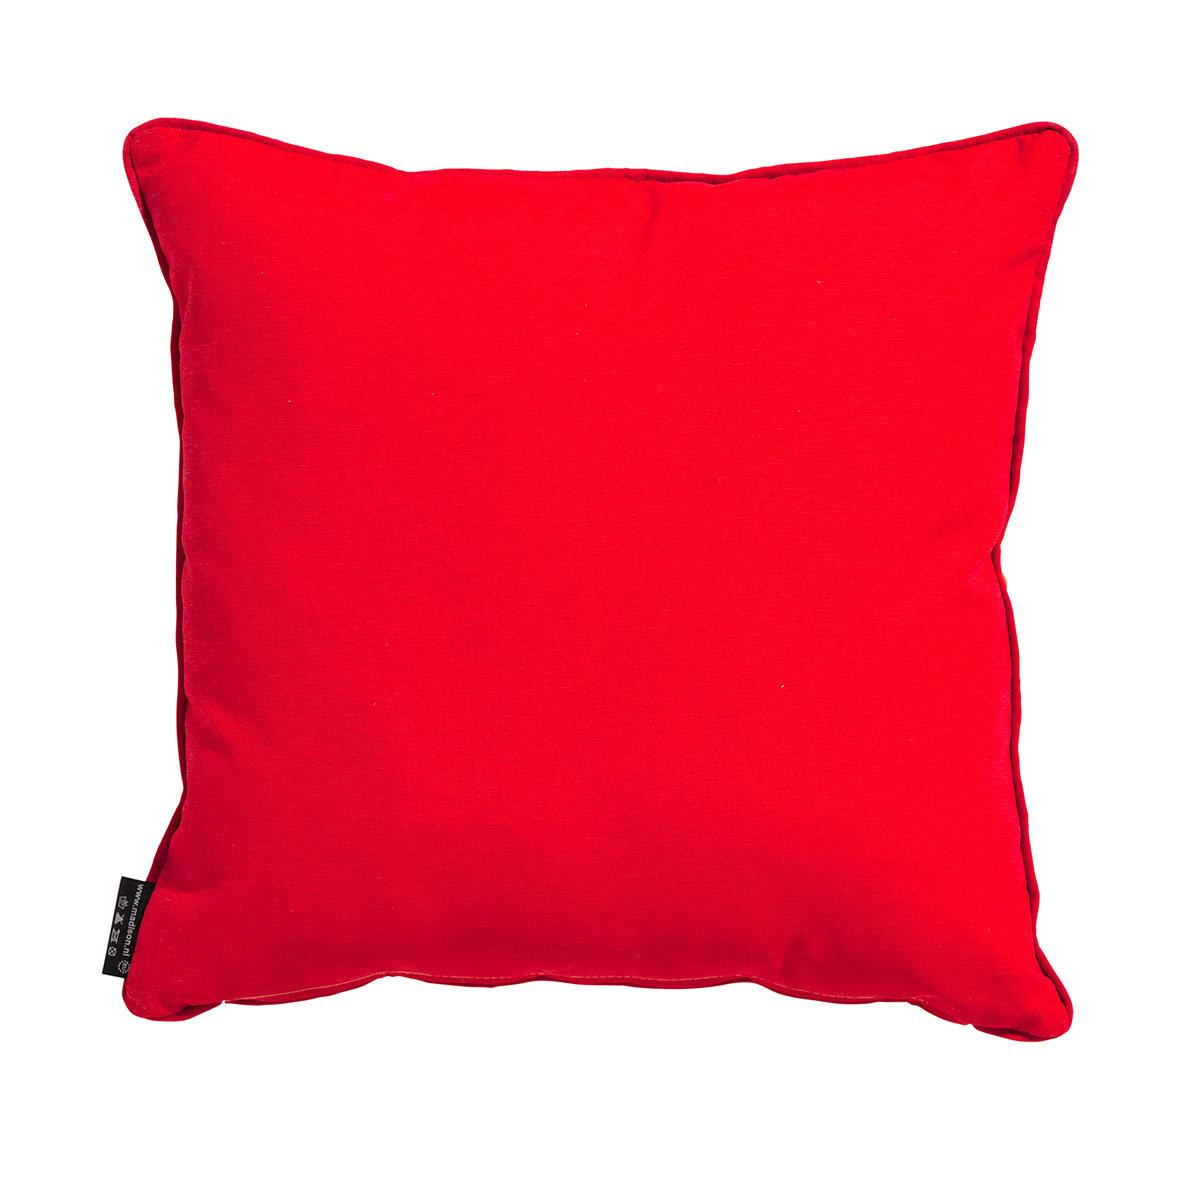 outdoor kissen bunte kuh von g rtner p tschke. Black Bedroom Furniture Sets. Home Design Ideas